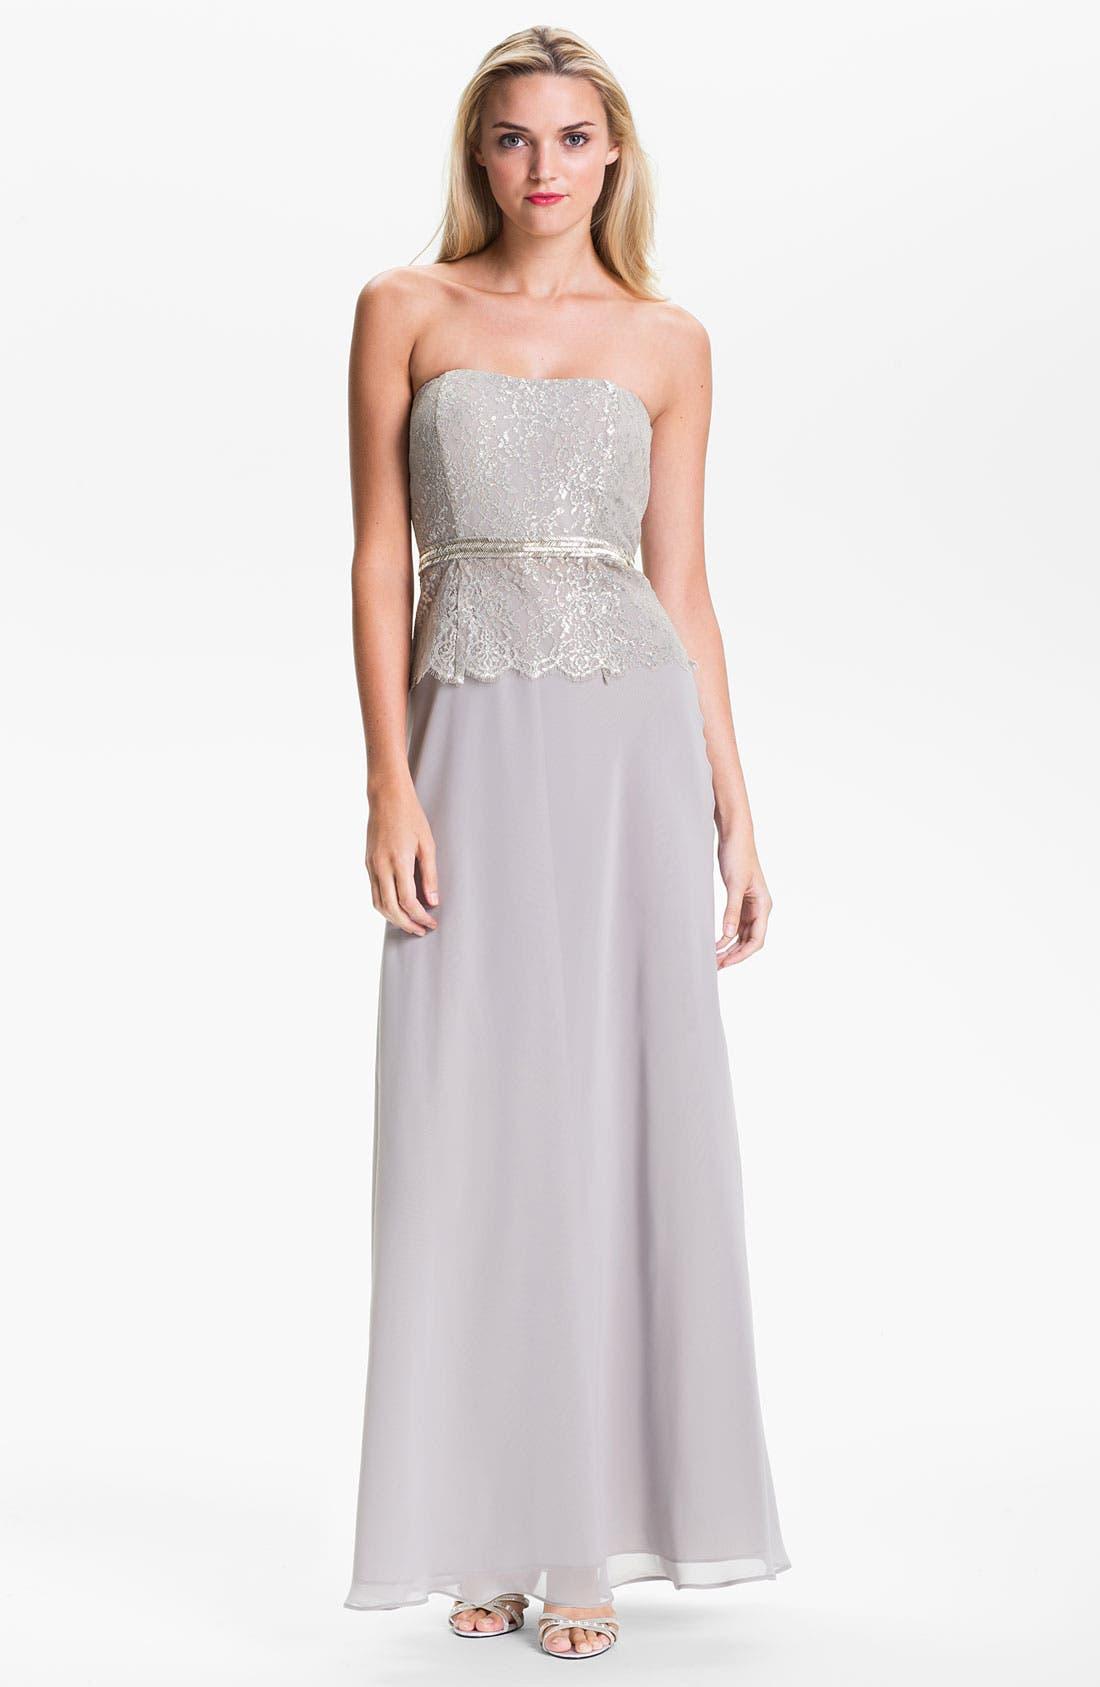 Main Image - Calvin Klein Strapless Metallic Lace & Chiffon Gown